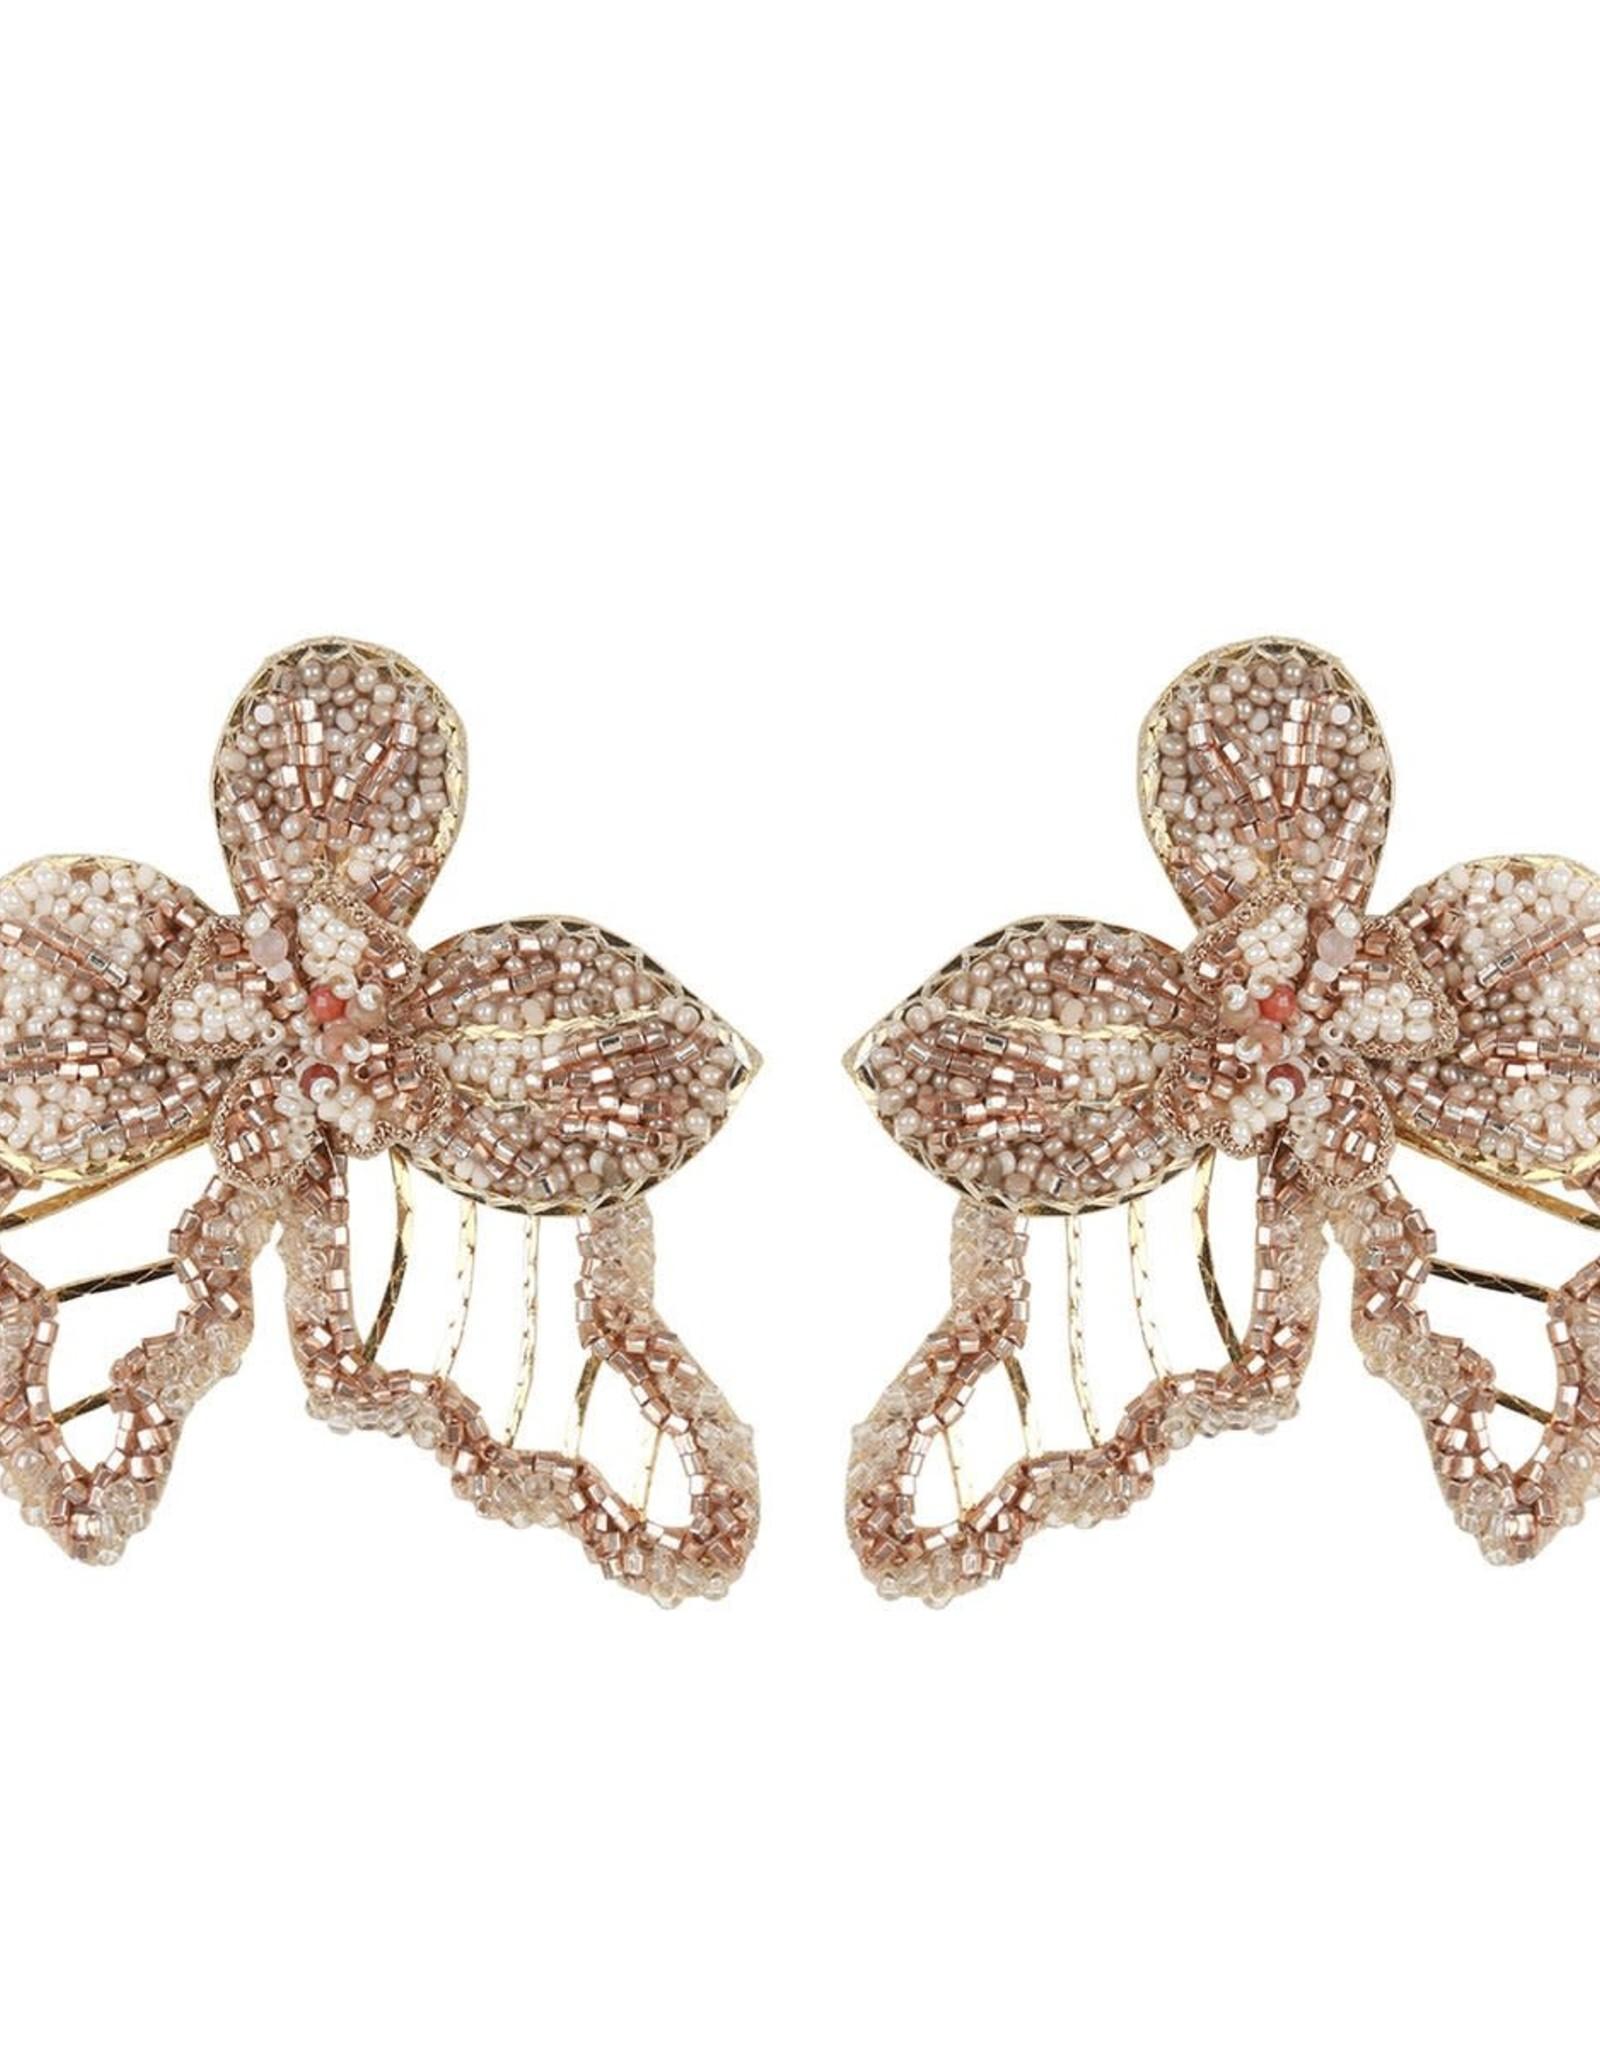 Deepa Gurnani Deepa Gurnani Vicki Earrings CLIP ON Gold